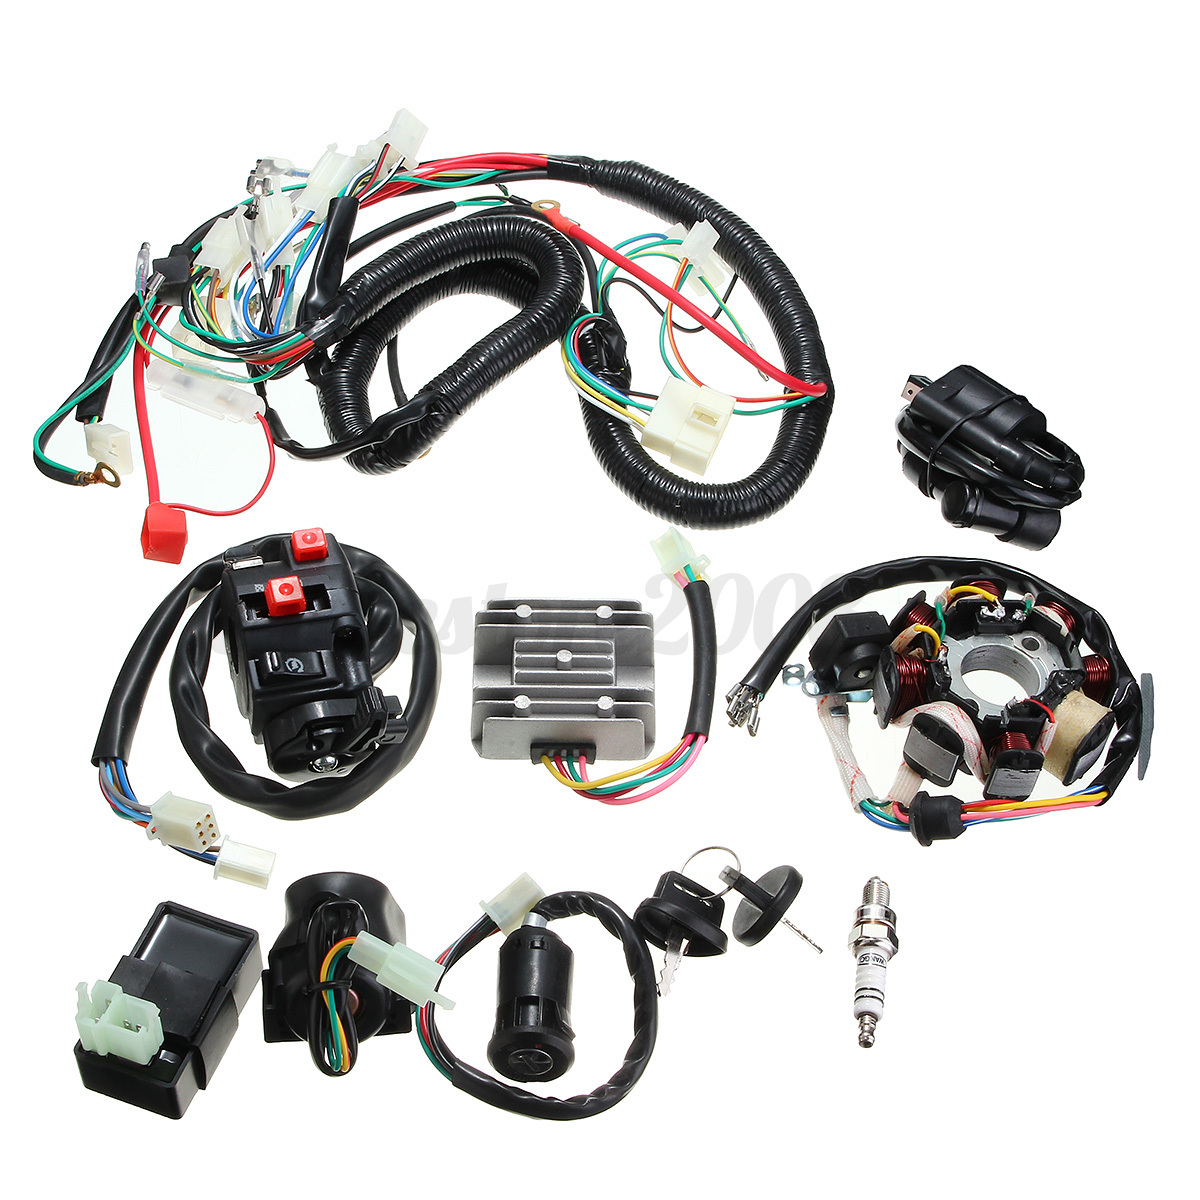 250cc quad bike wiring diagram boss v plow 125 150 200 cdi wire harness stator assembly